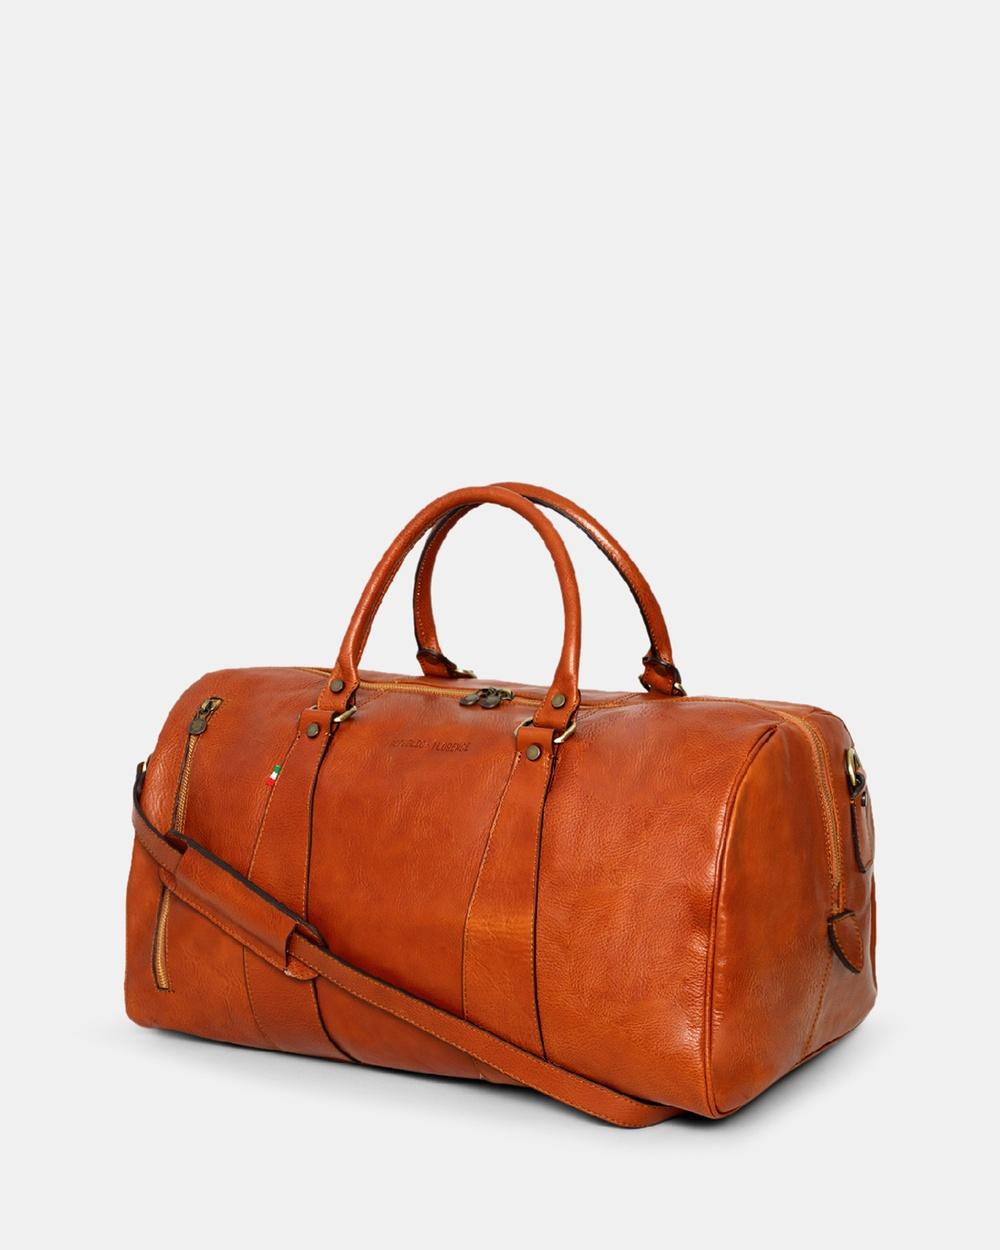 Republic of Florence The Nardi Duffle Bags Tan